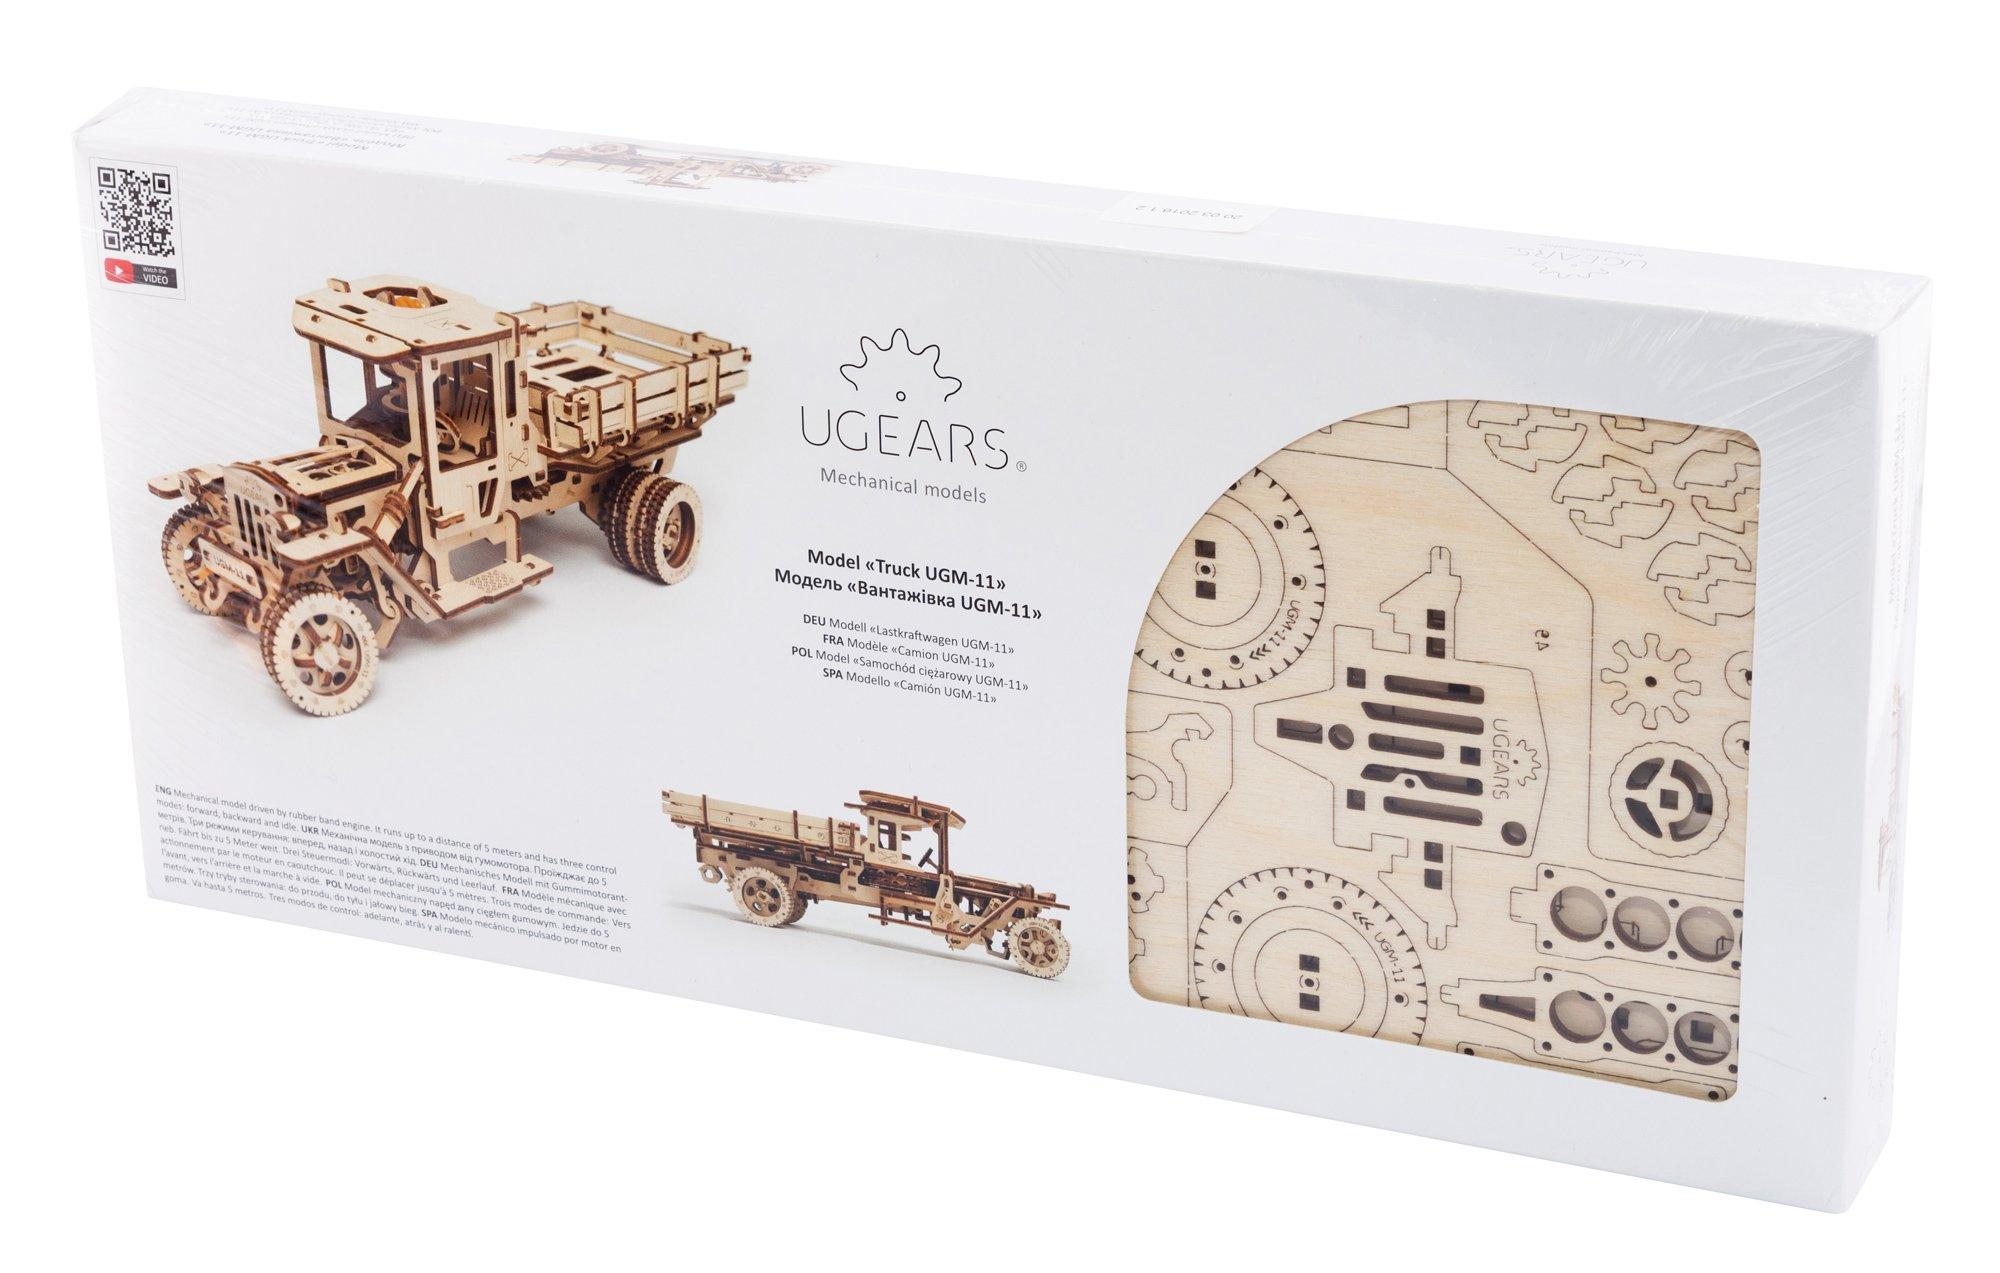 S.T.E.A.M. Line Toys UGears Mechanical Models 3-D Wooden Puzzle - Mechanical 11 Truck 1920's Model T 4